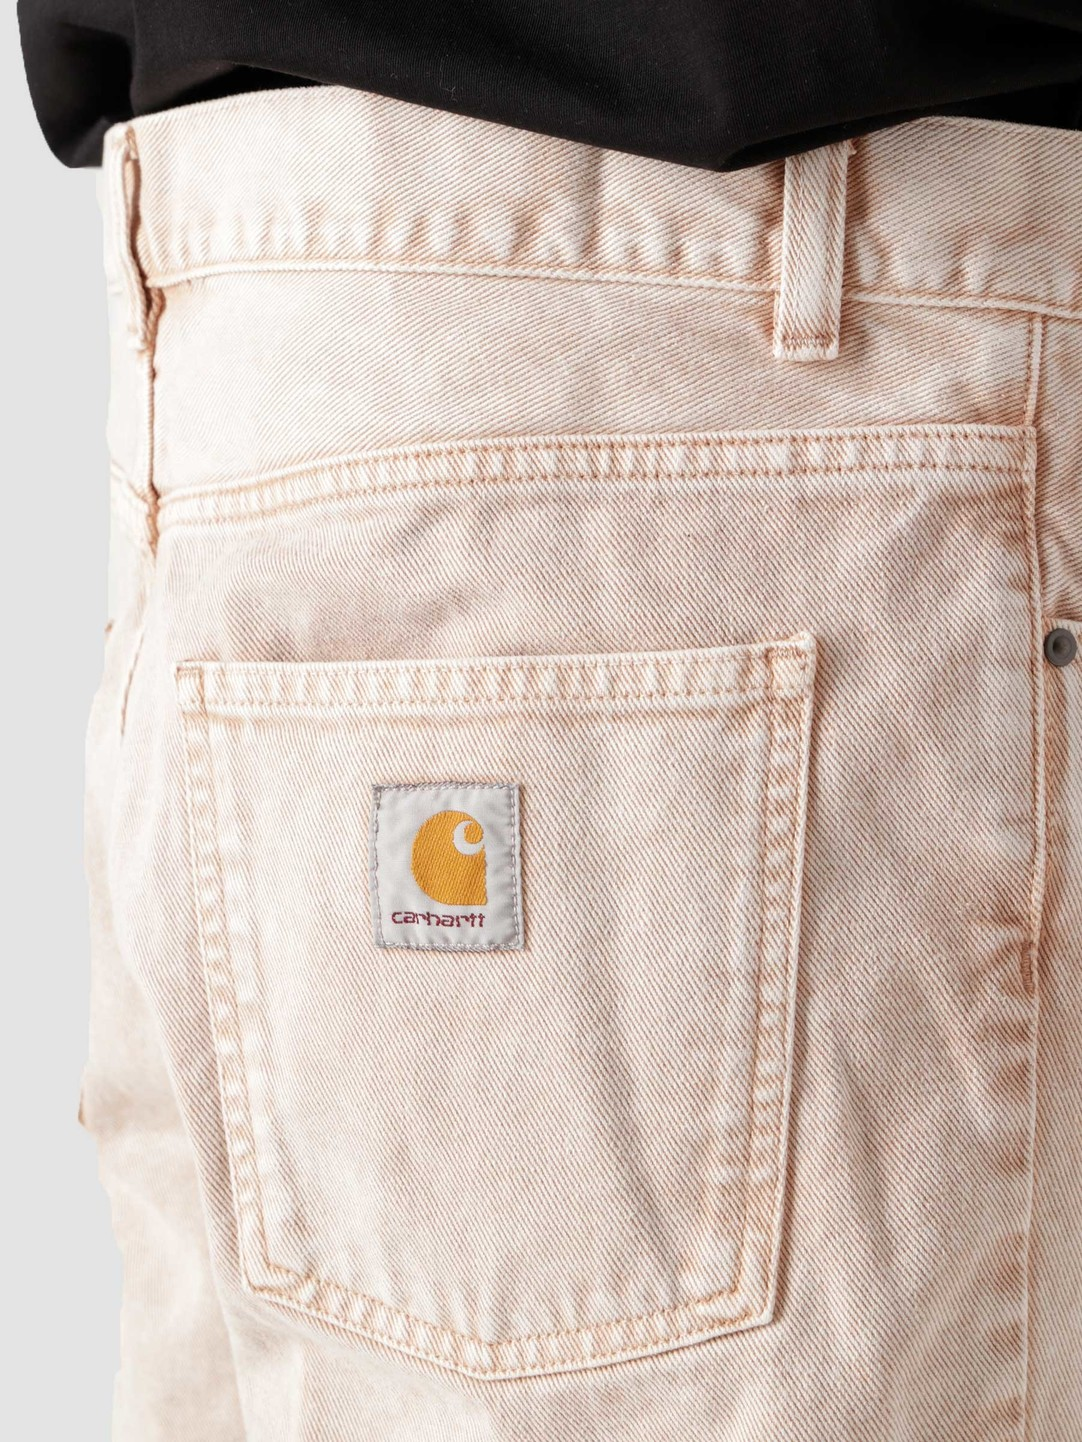 Carhartt WIP Carhartt WIP Newel Short Dusty H Brown I029149-07EWD